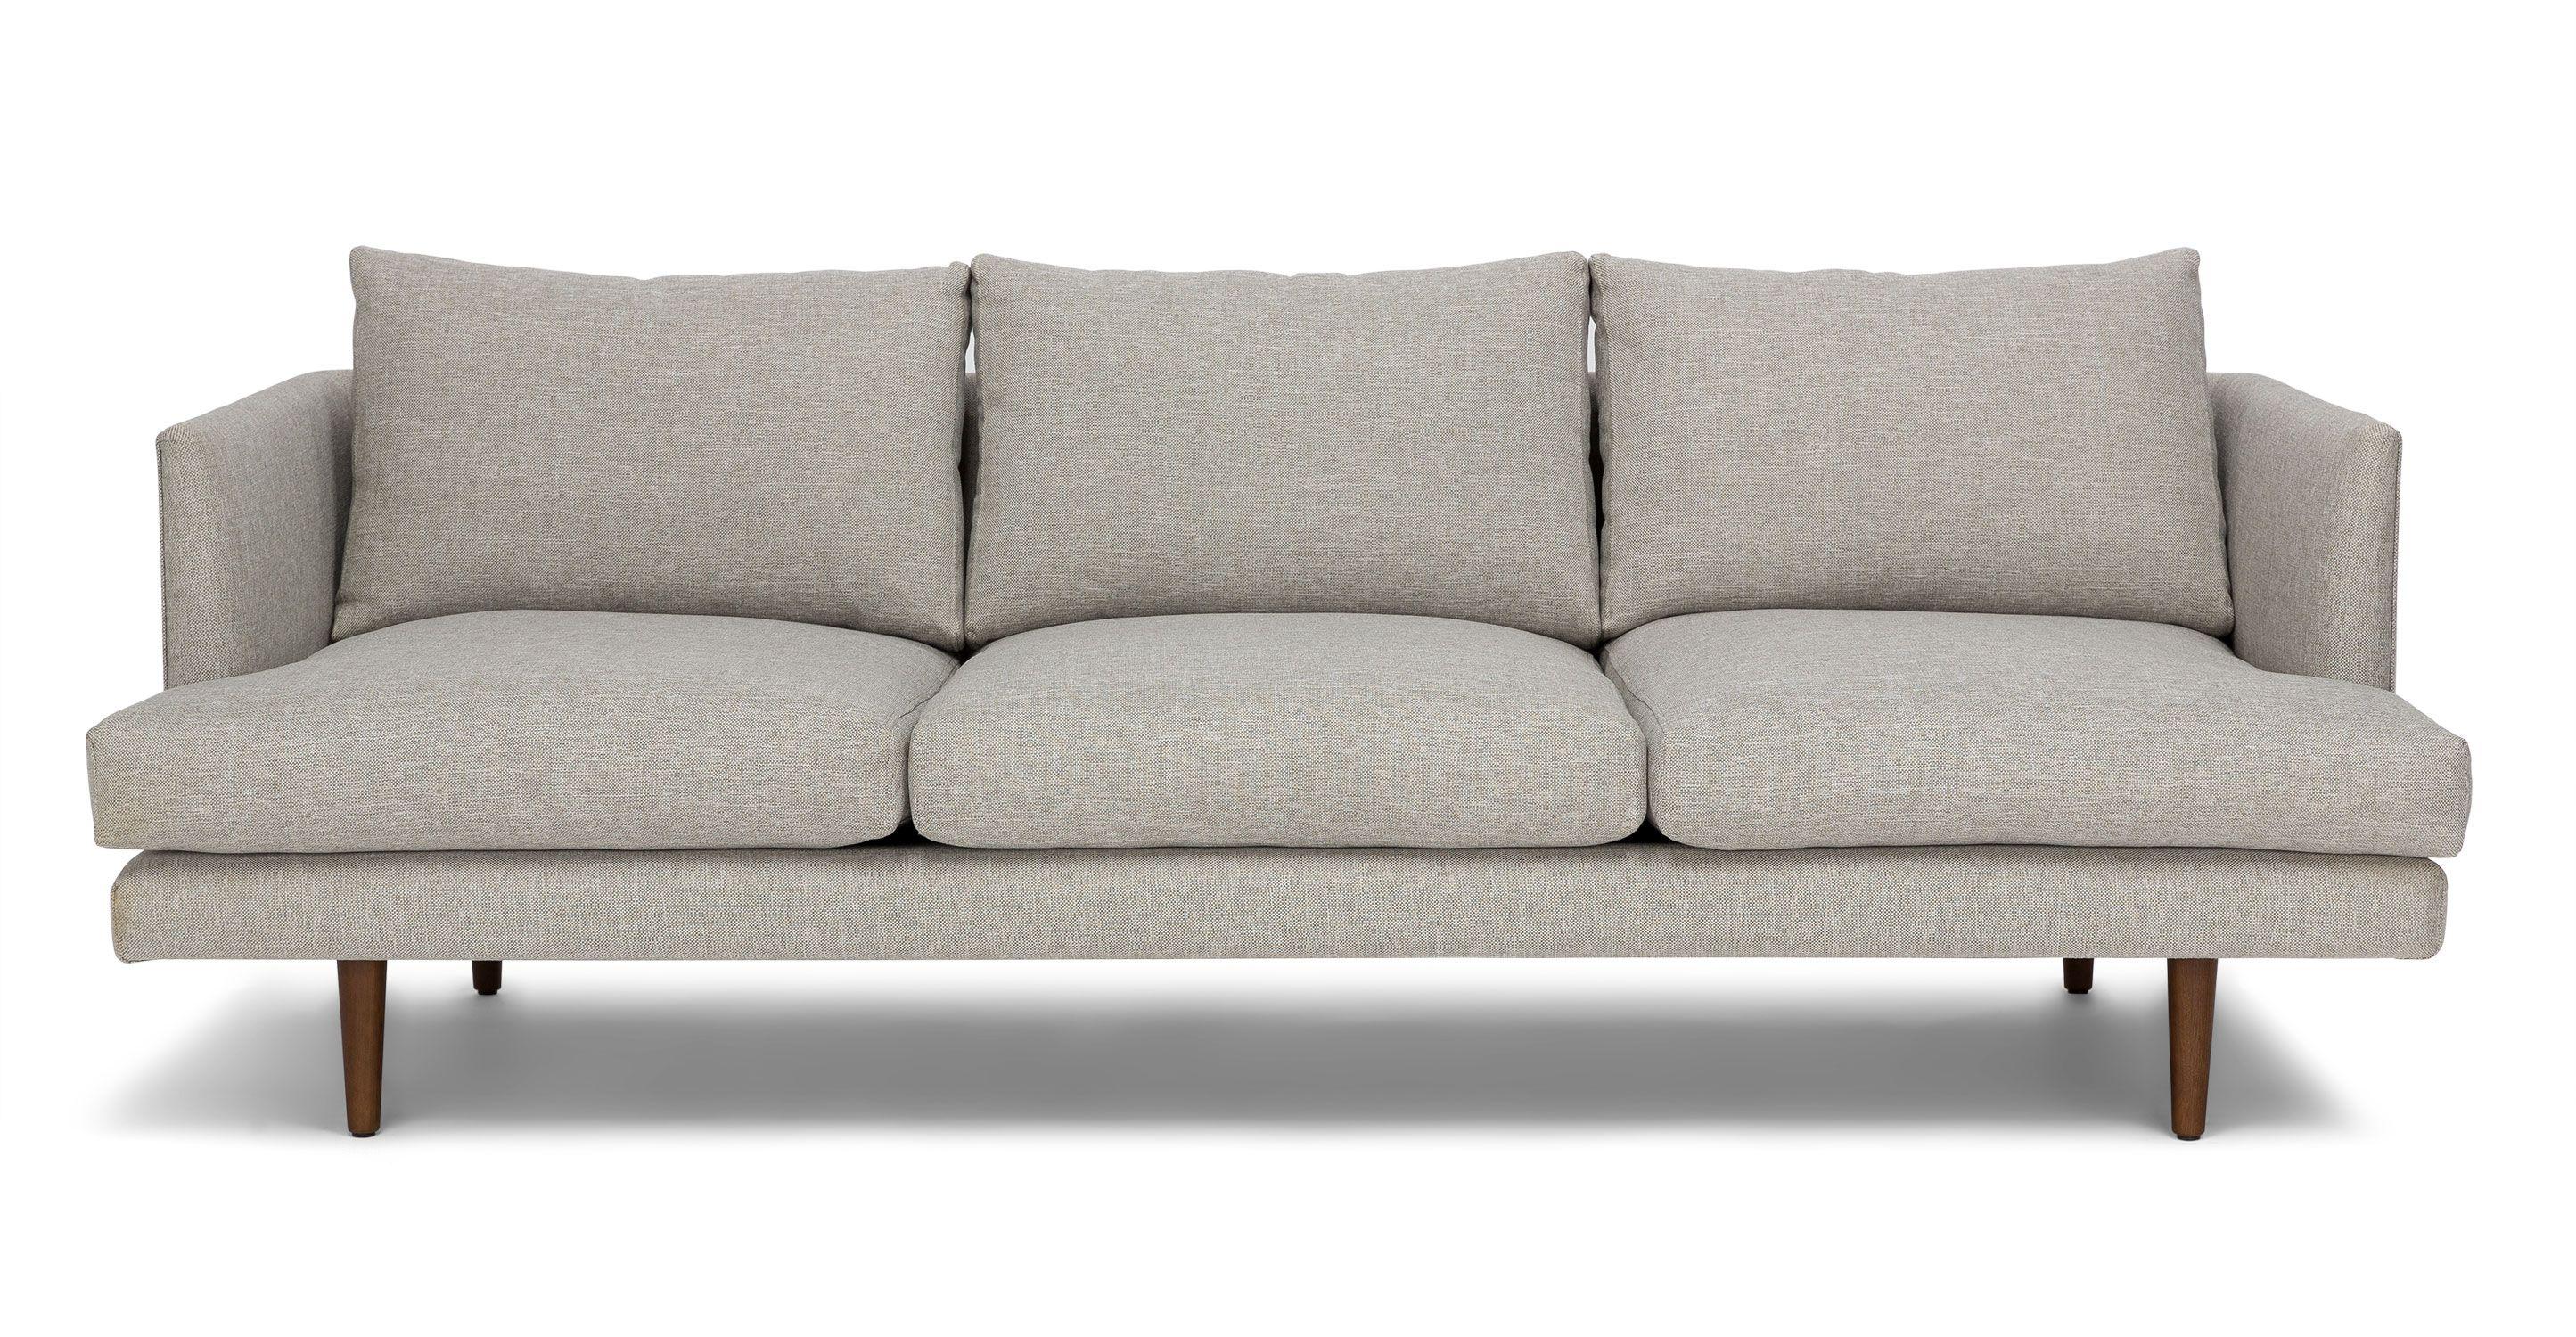 Burrard Seasalt Gray Sofa Light Gray Sofas Modern Sofa Couch